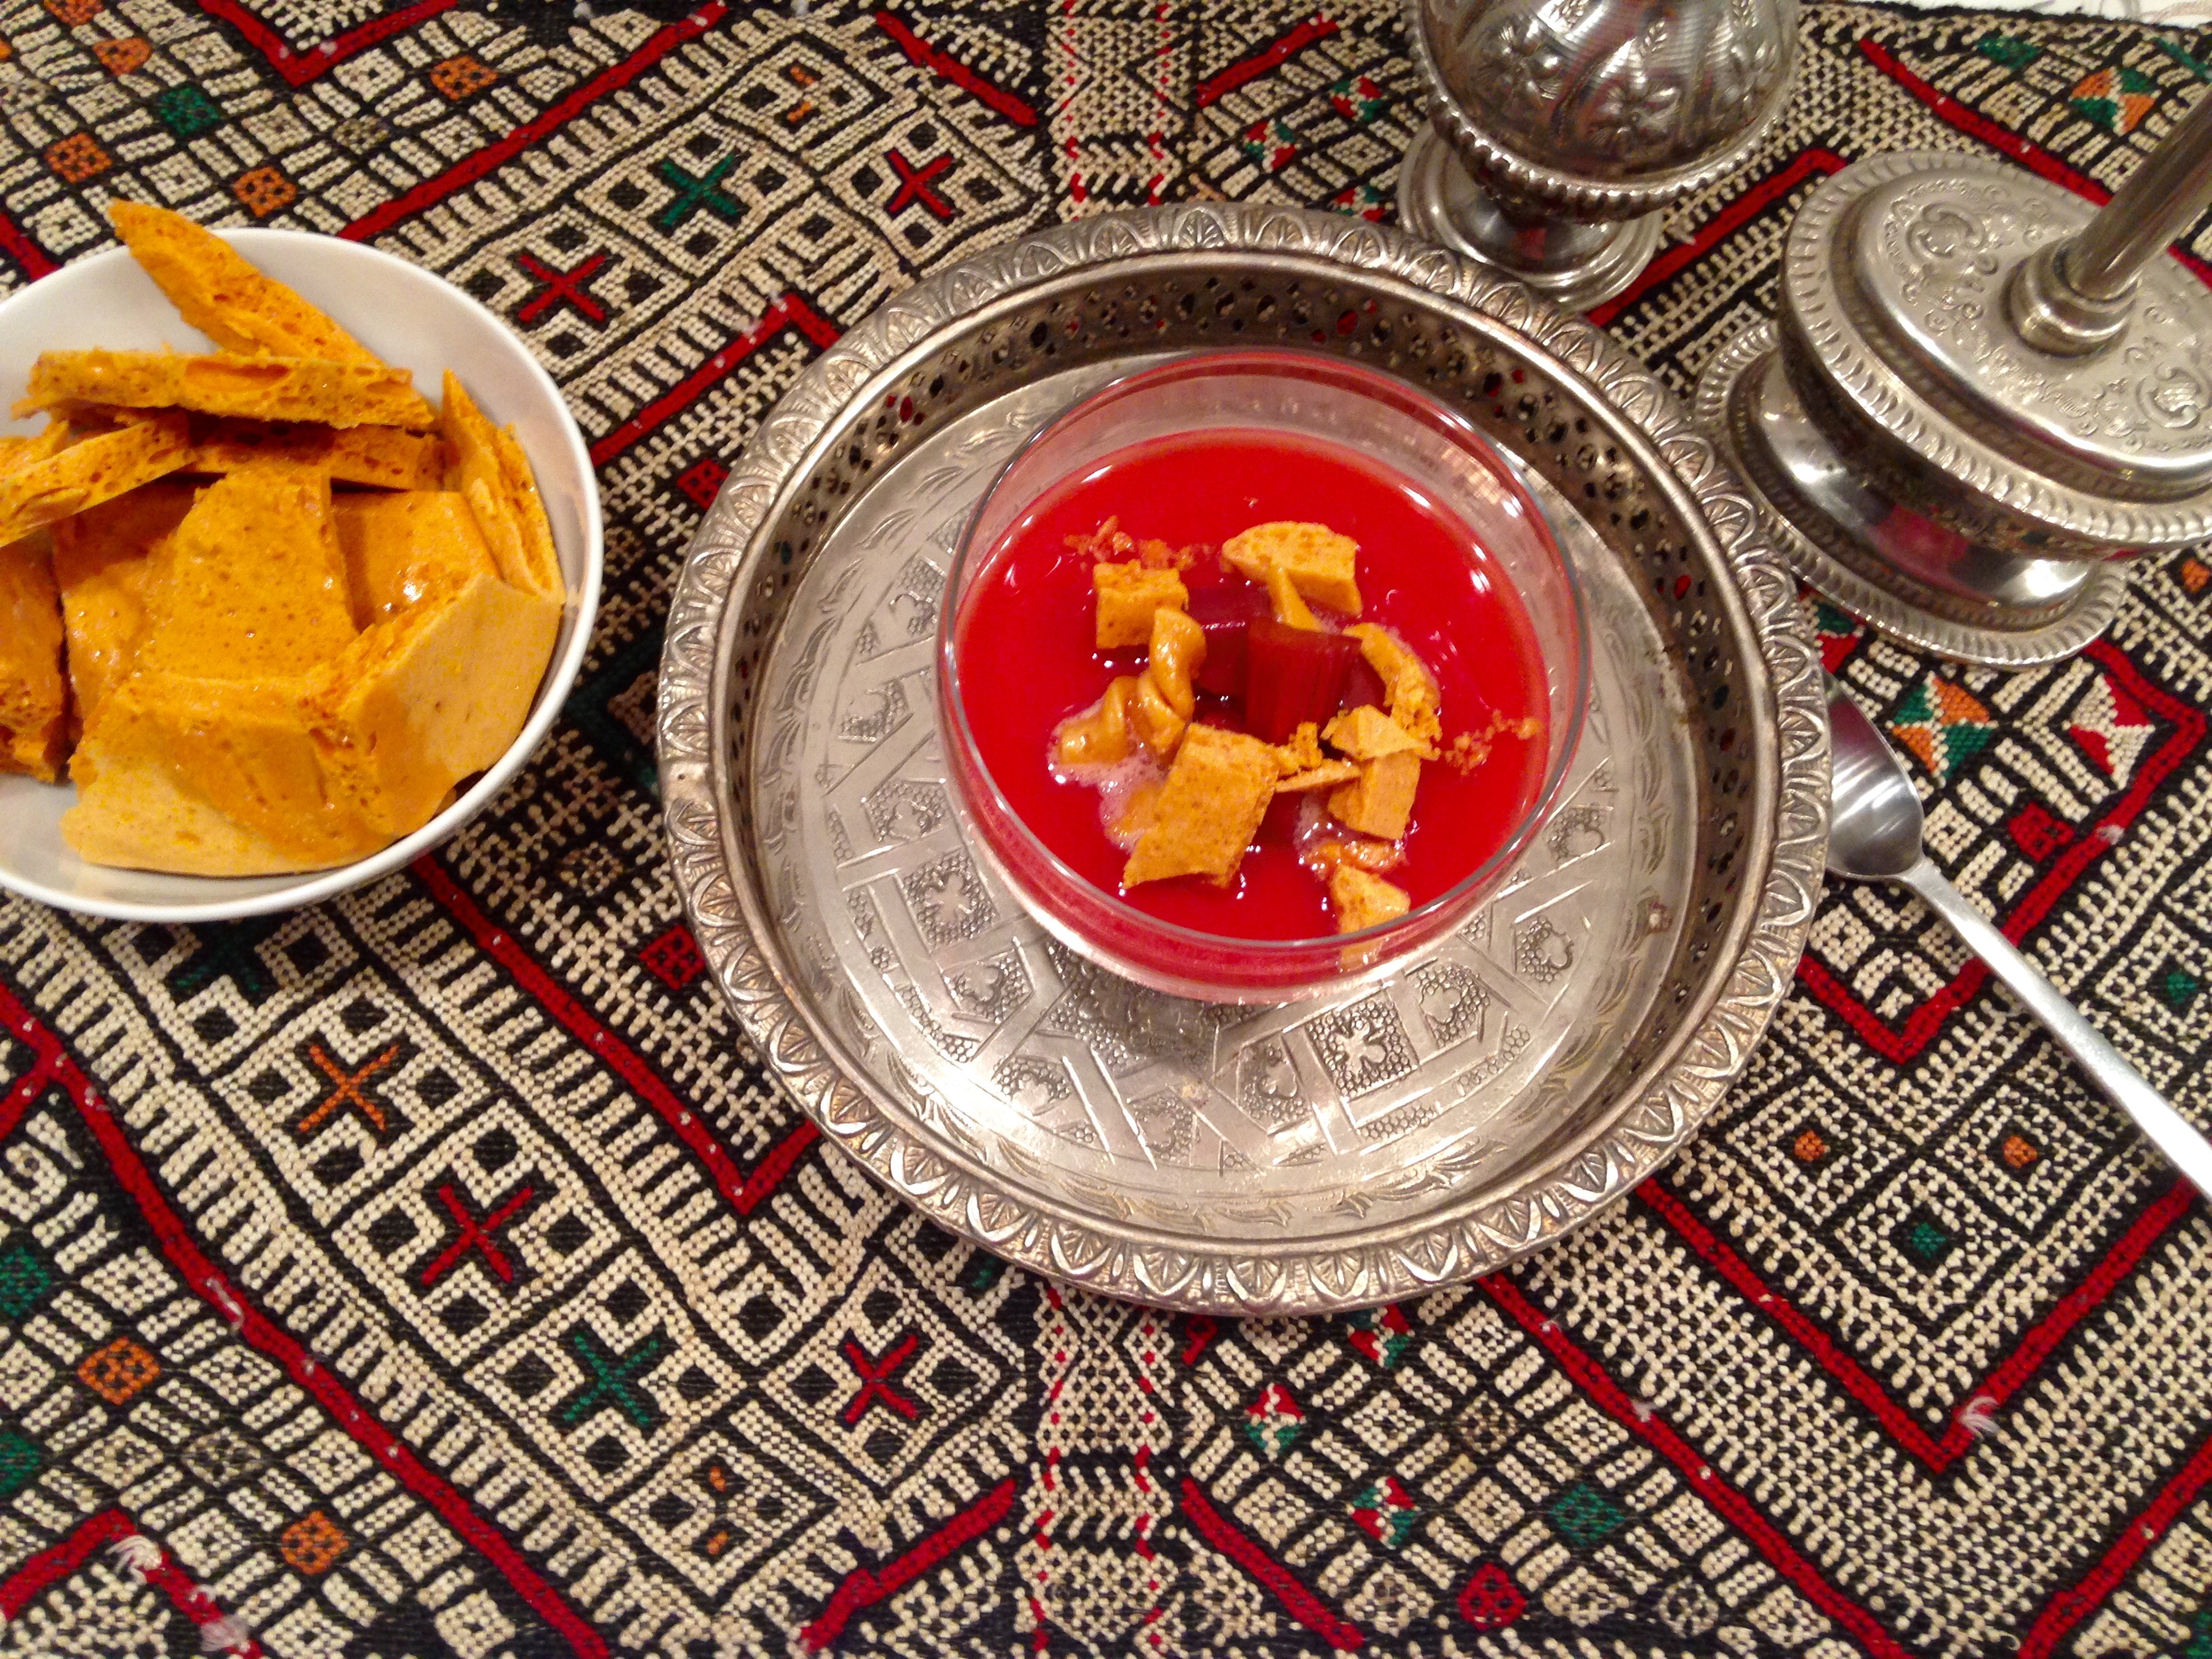 Gelée de yaourt rhubarbe et honeycomb